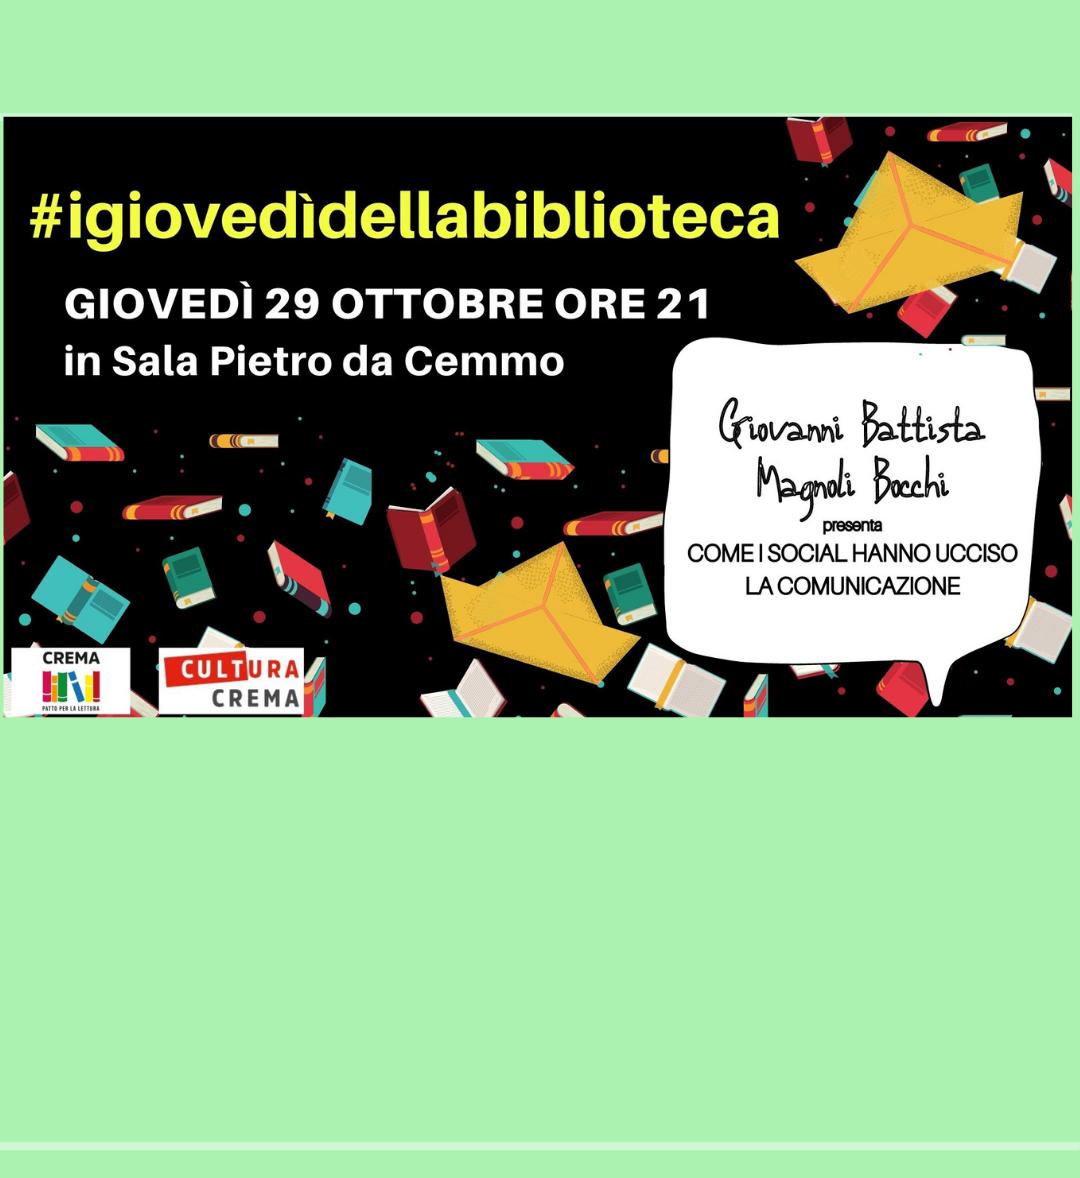 G2020-10-29-Giovanni Battista